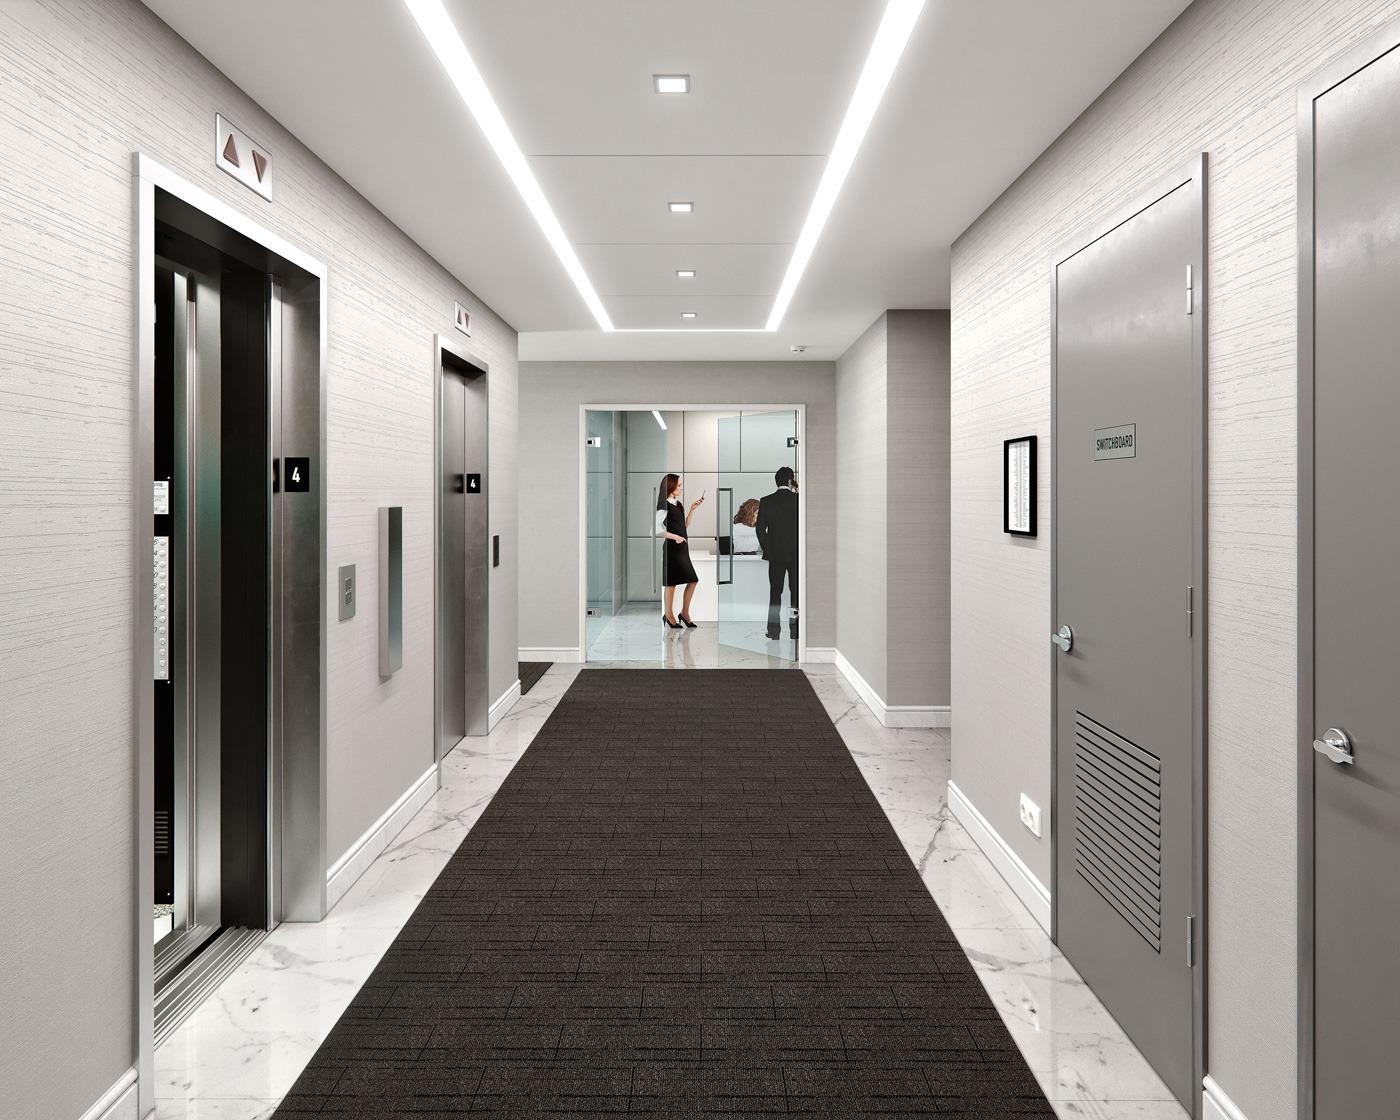 B ro 3d visualisierung render vision for Innenarchitektur studium new york